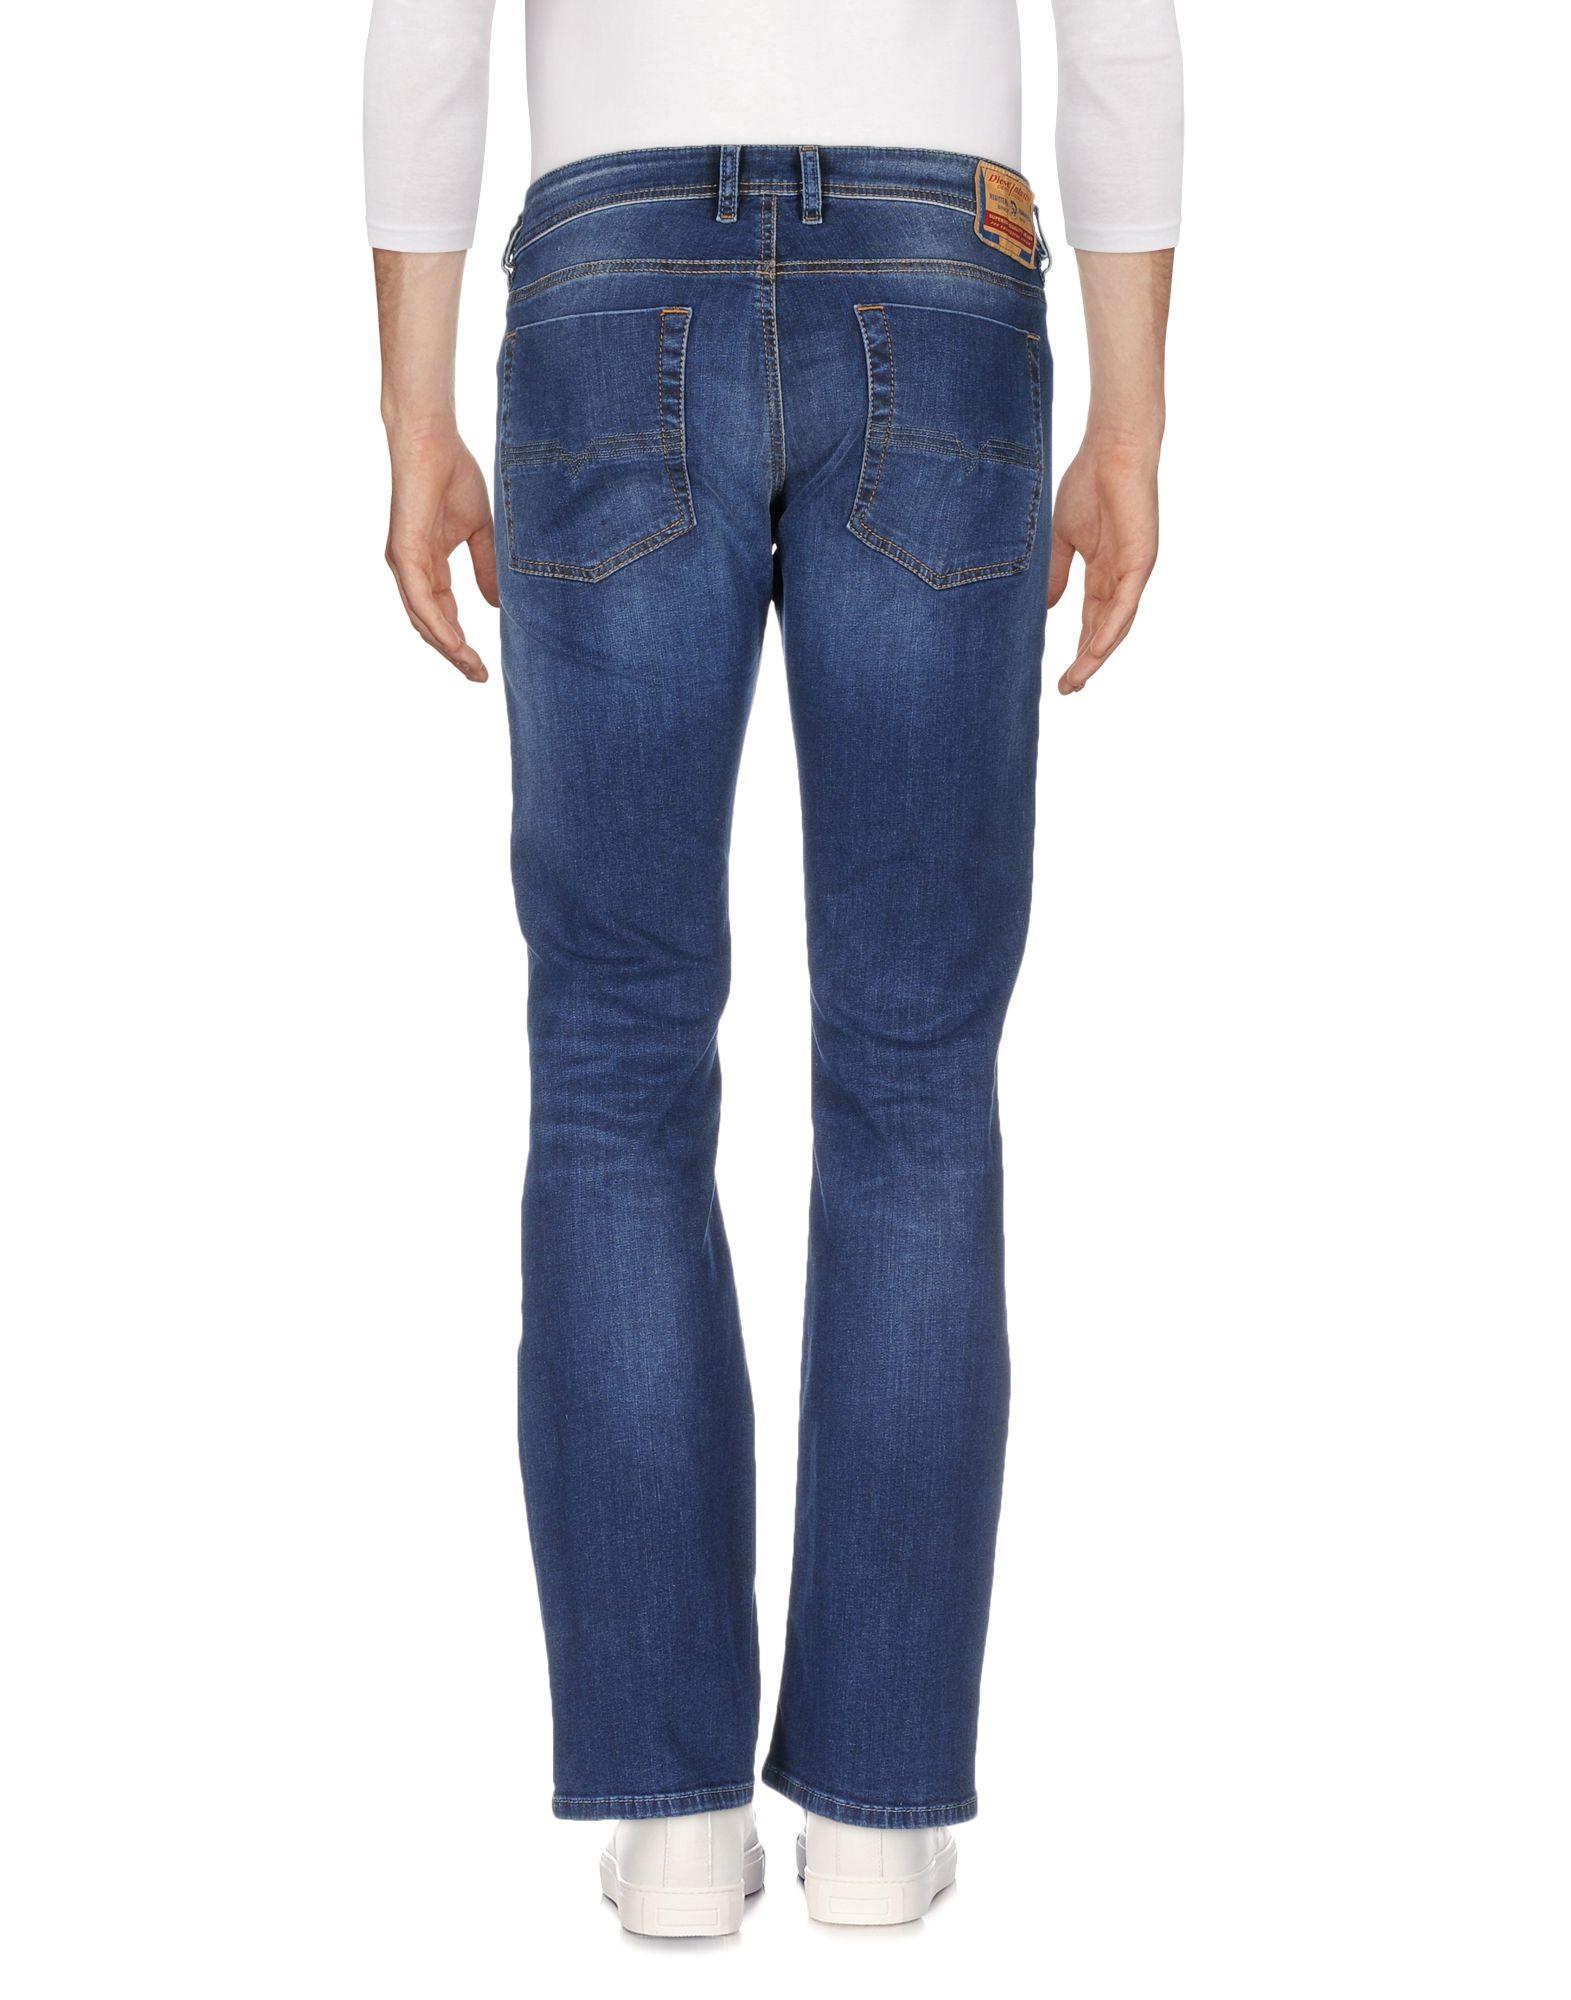 Pantaloni Jeans Diesel 42653262JI Uomo - 42653262JI Diesel 5820f7